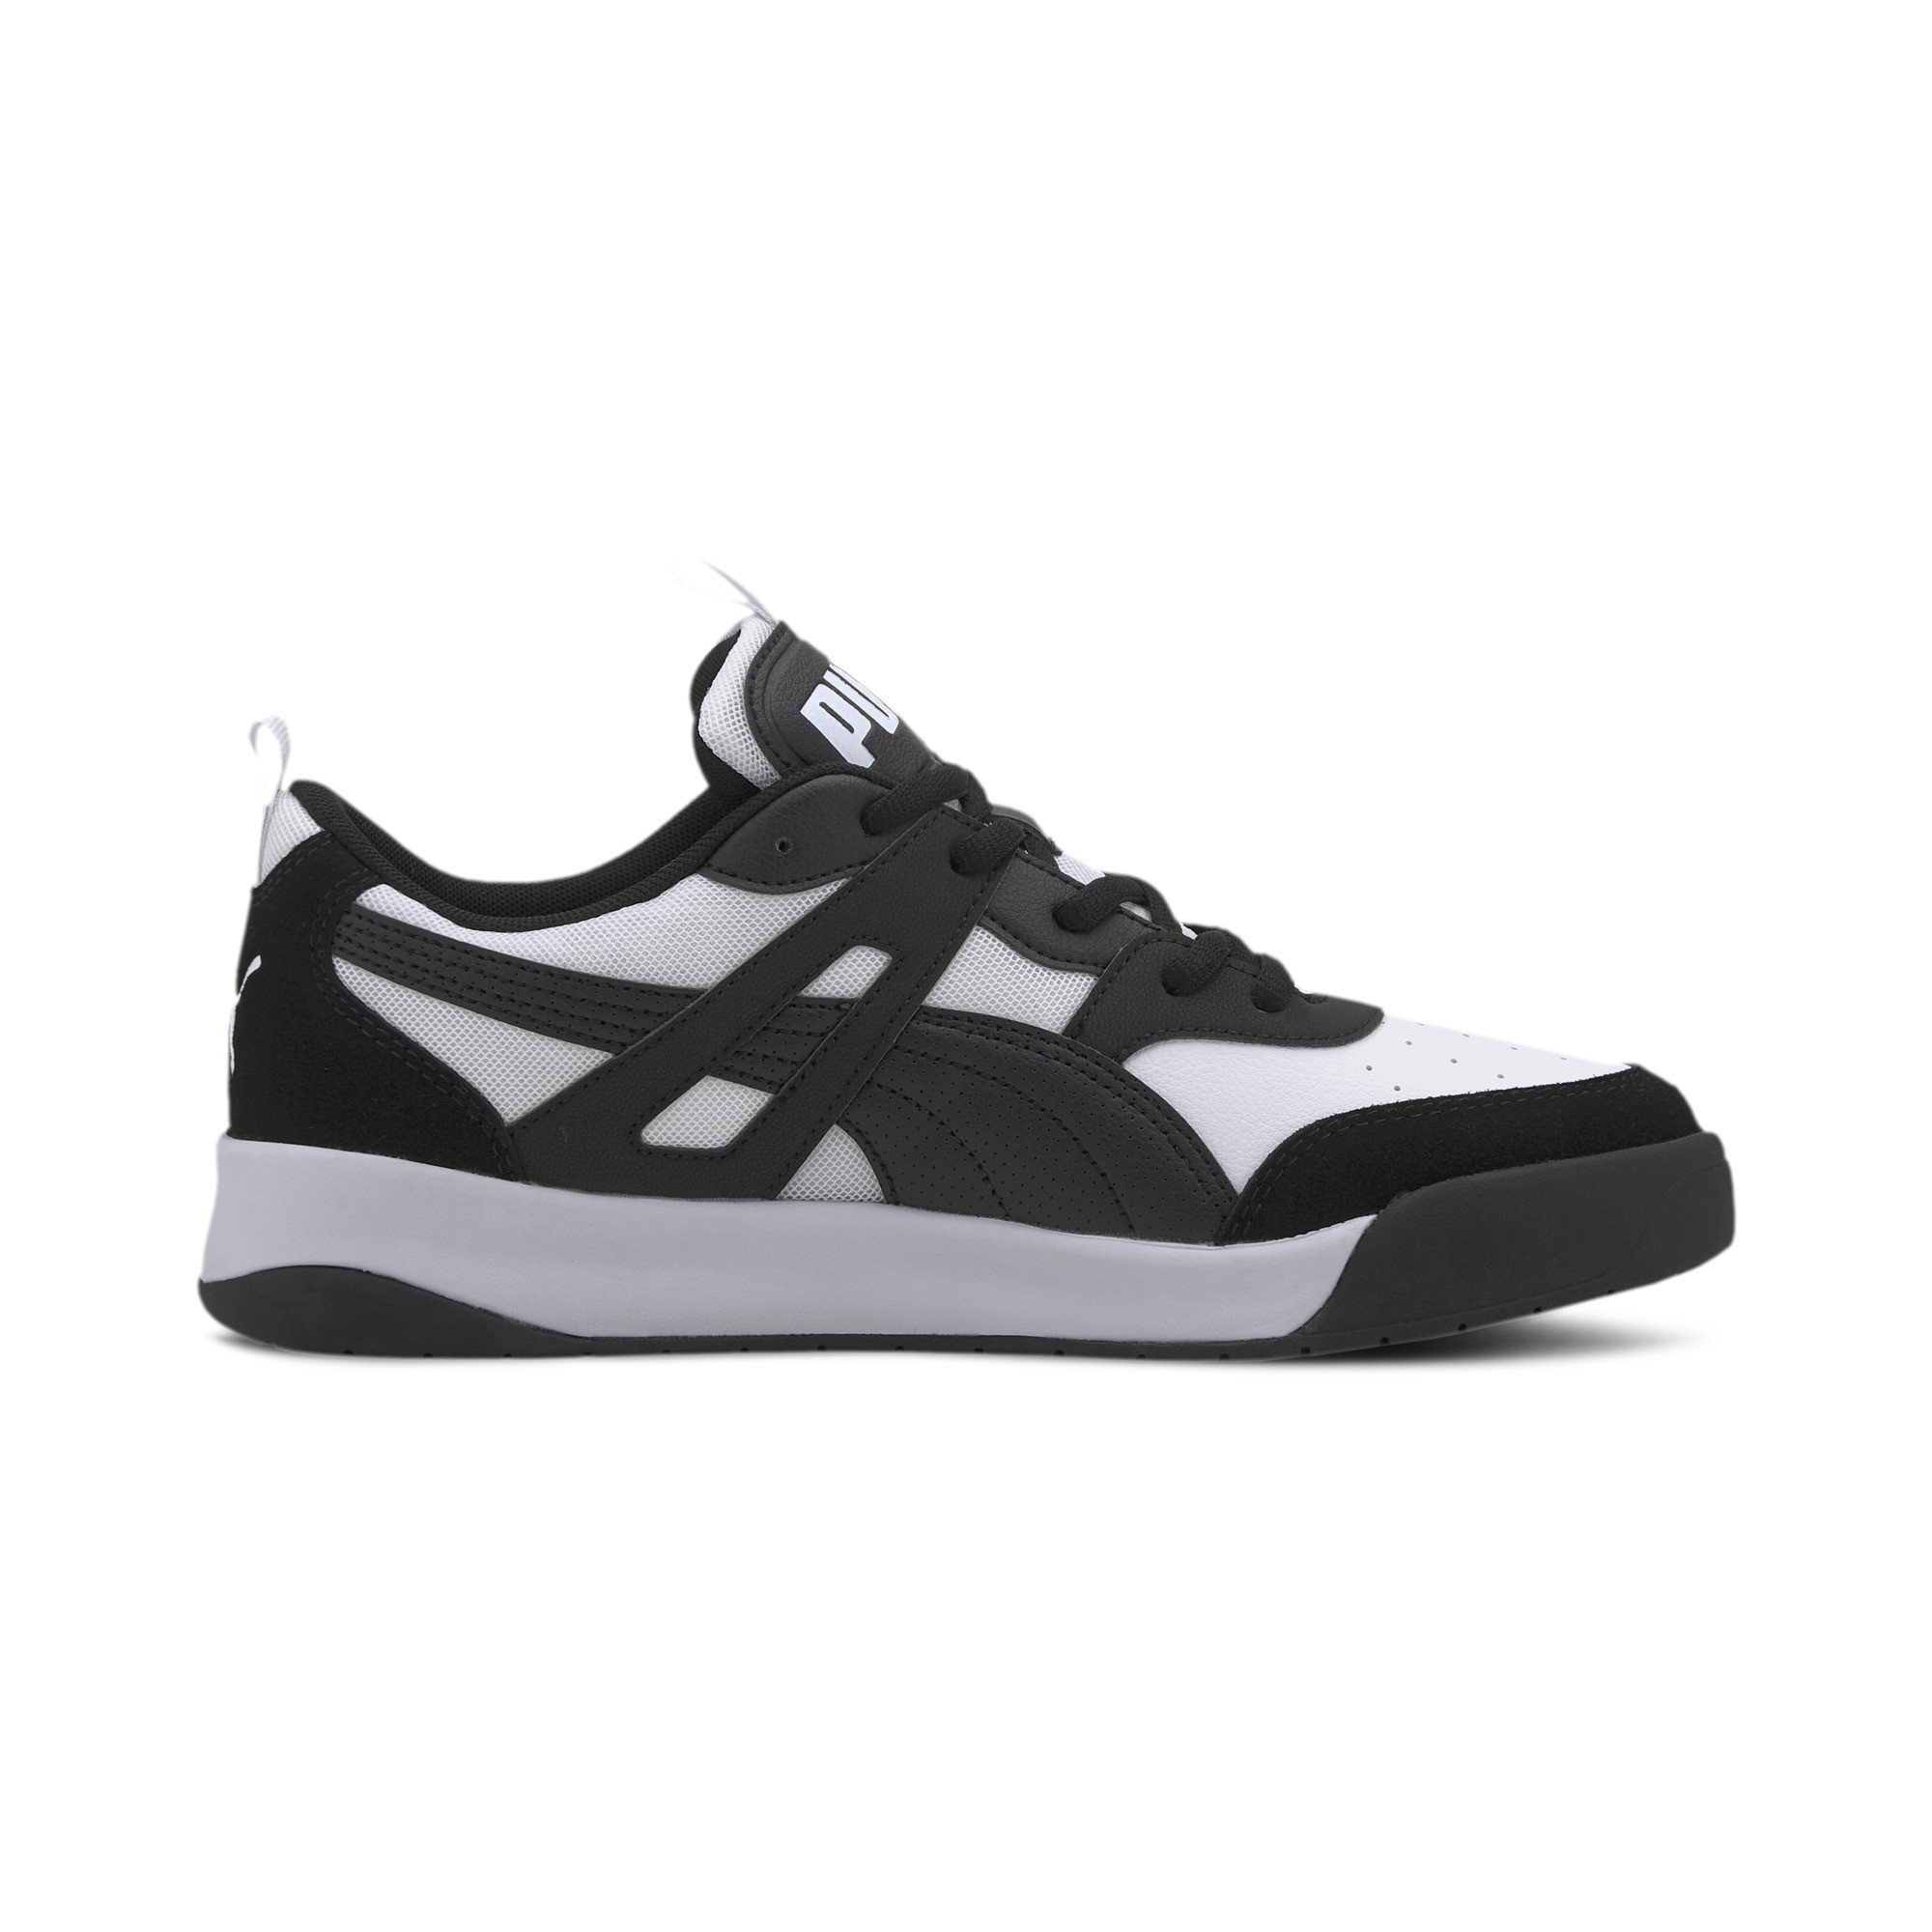 miniature 11 - Puma Men's Backcourt Sneakers